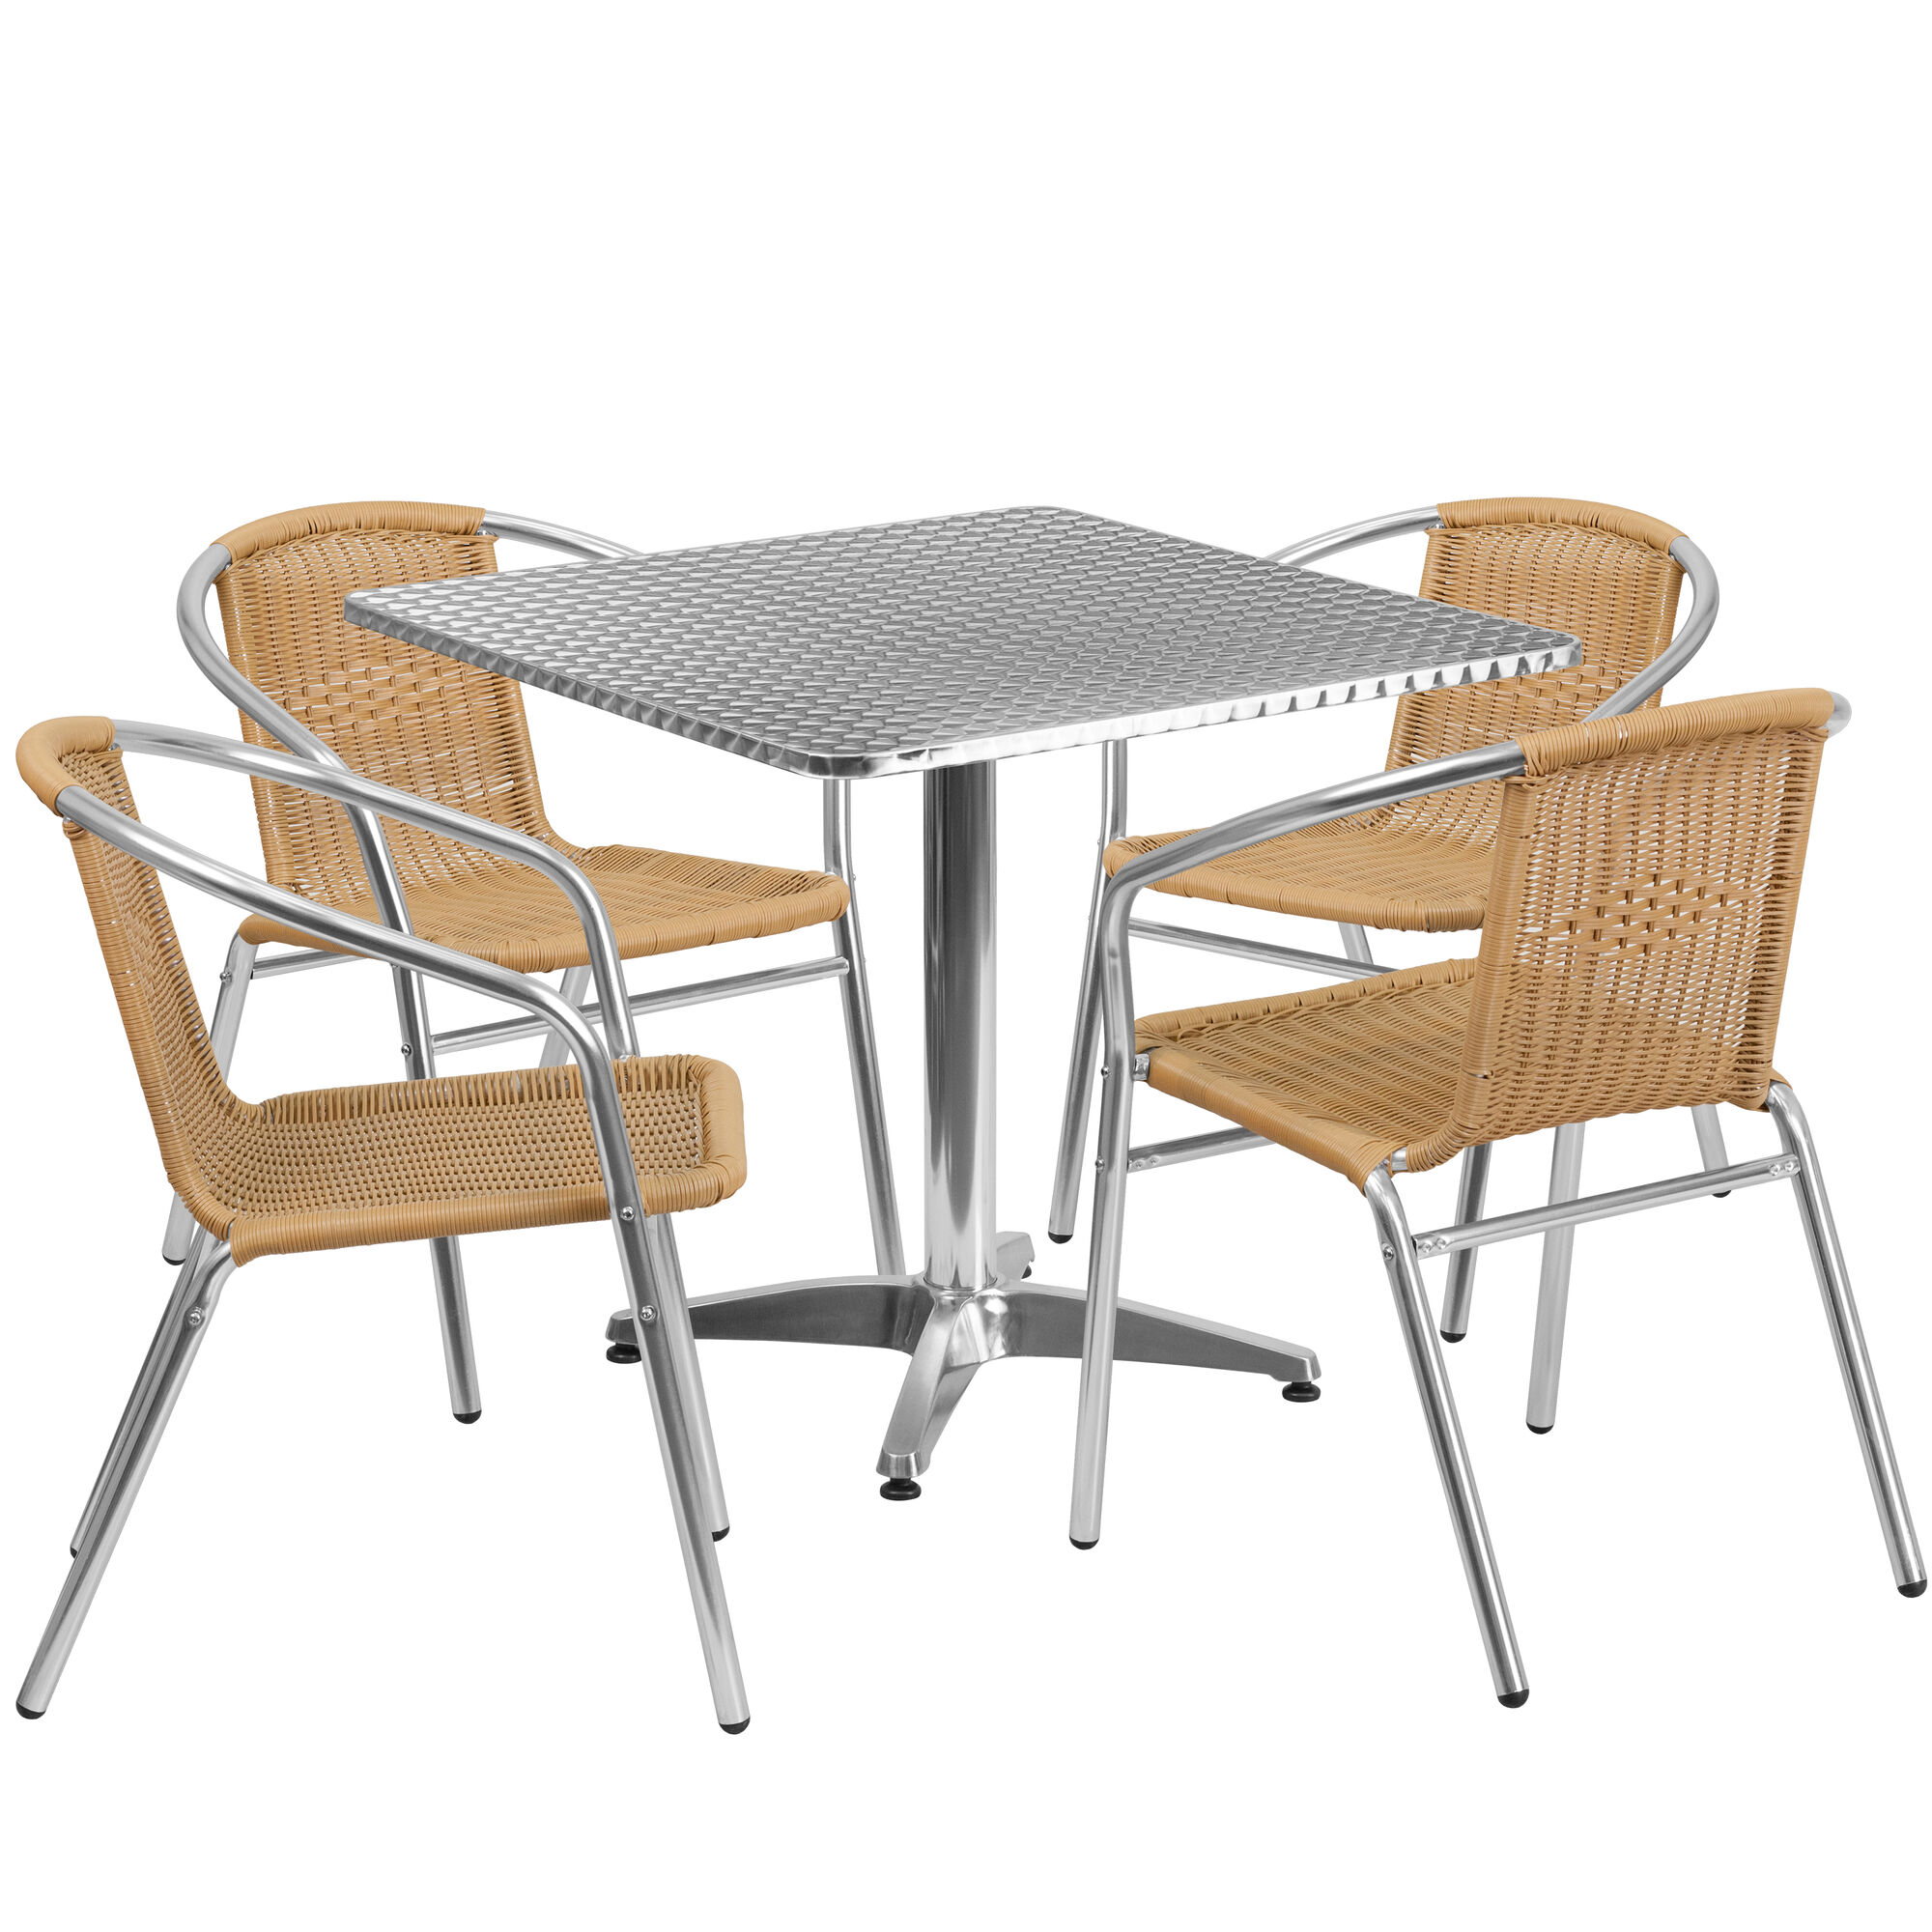 Sq aluminum table set tlh alum bgechr gg